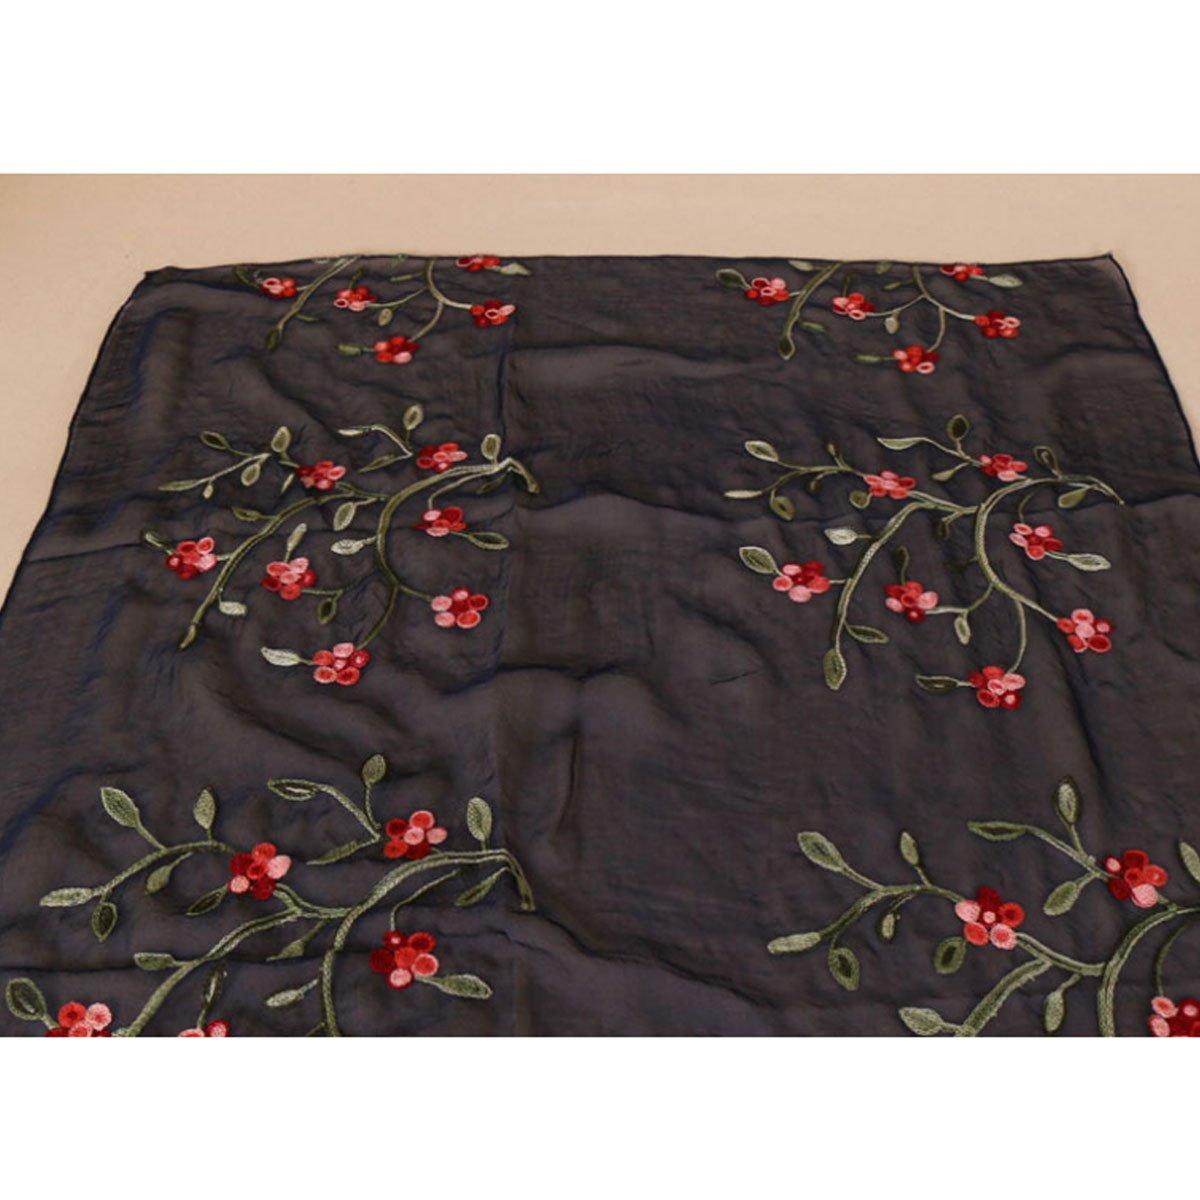 Meliya Fashion Lady Women Long Scarf Ultra-thin Floral Embroidery Sheer Chiffon Shawl Wrap Sunscreen